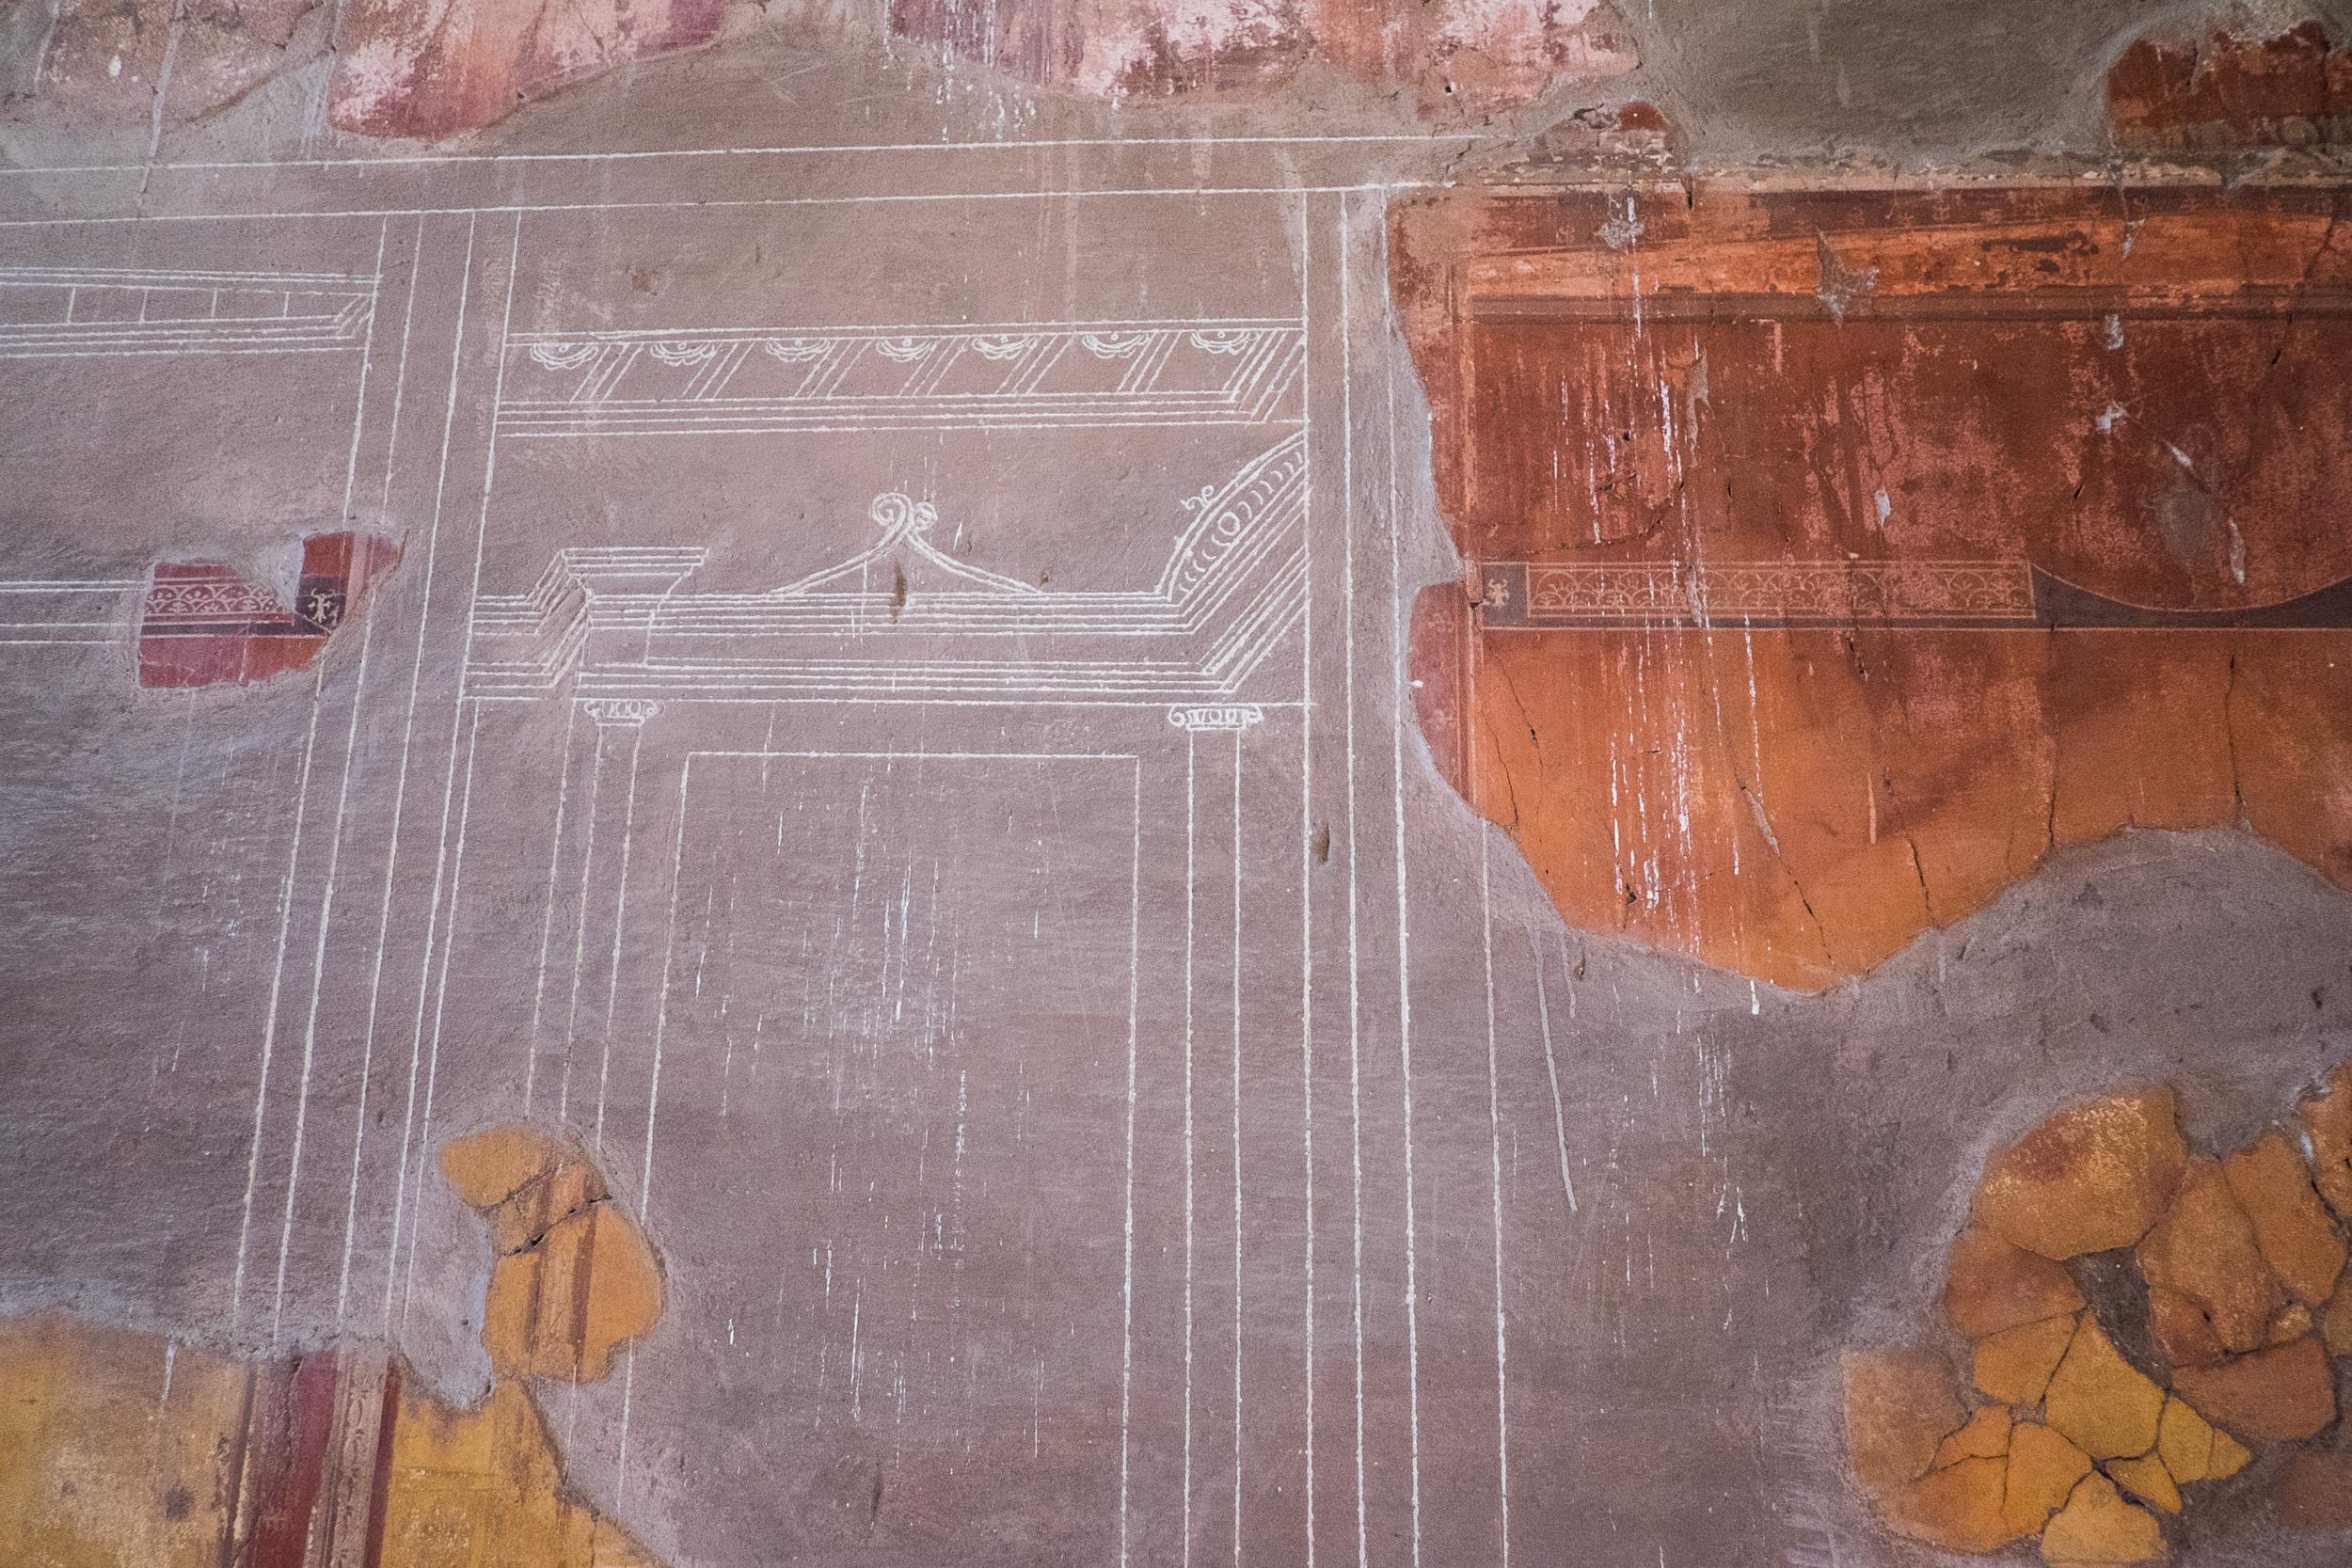 Score Marks for Frescoes